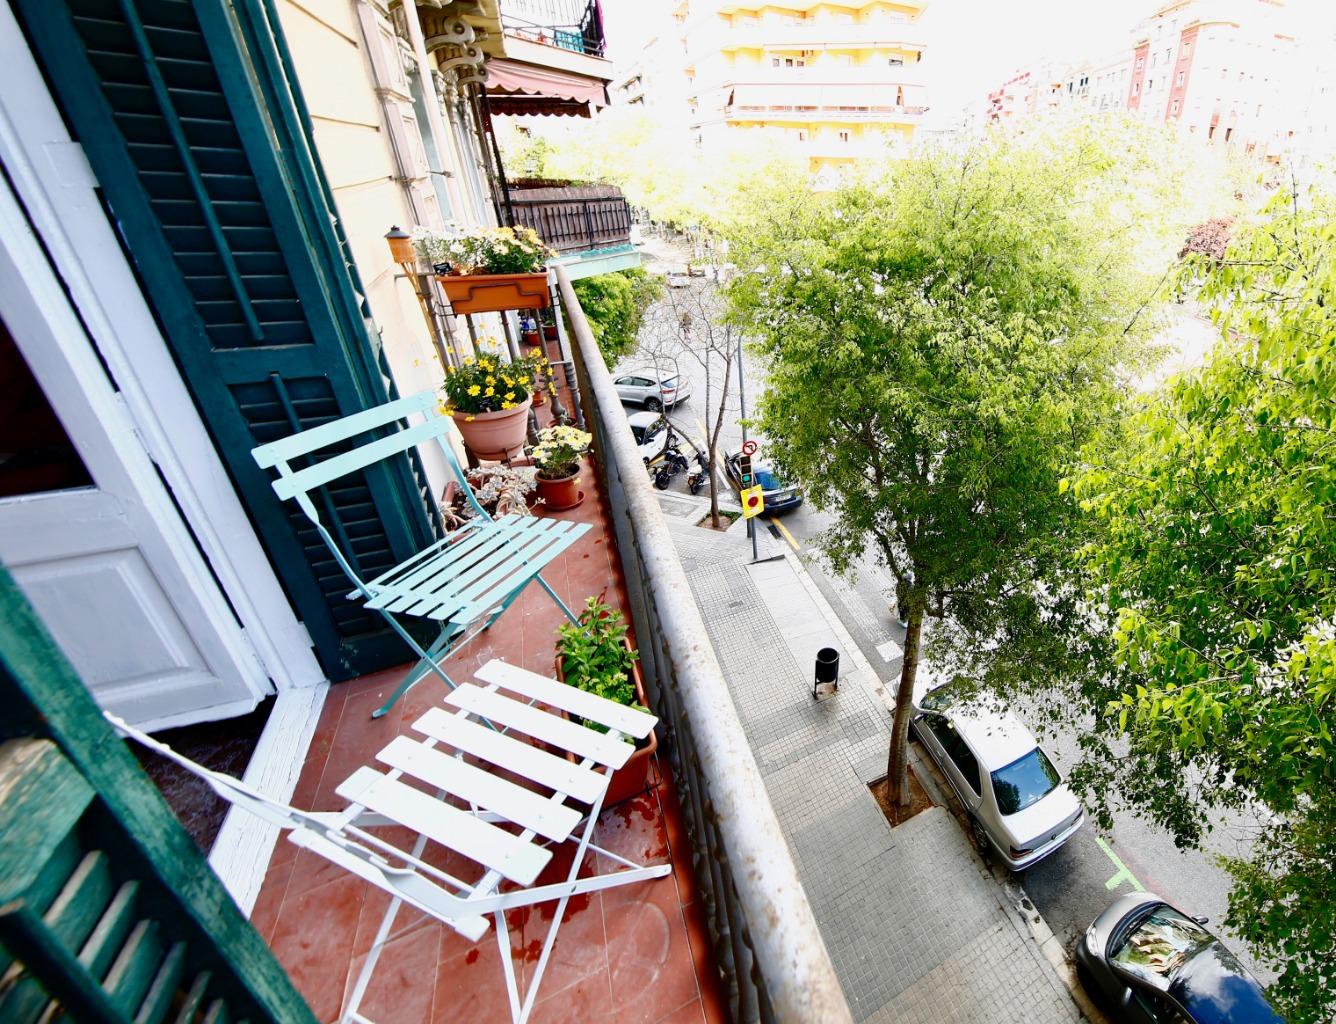 Lloguer Pis  Calle floridablanca. Floridablanca sant antoni 4 hab amueblado con balcón